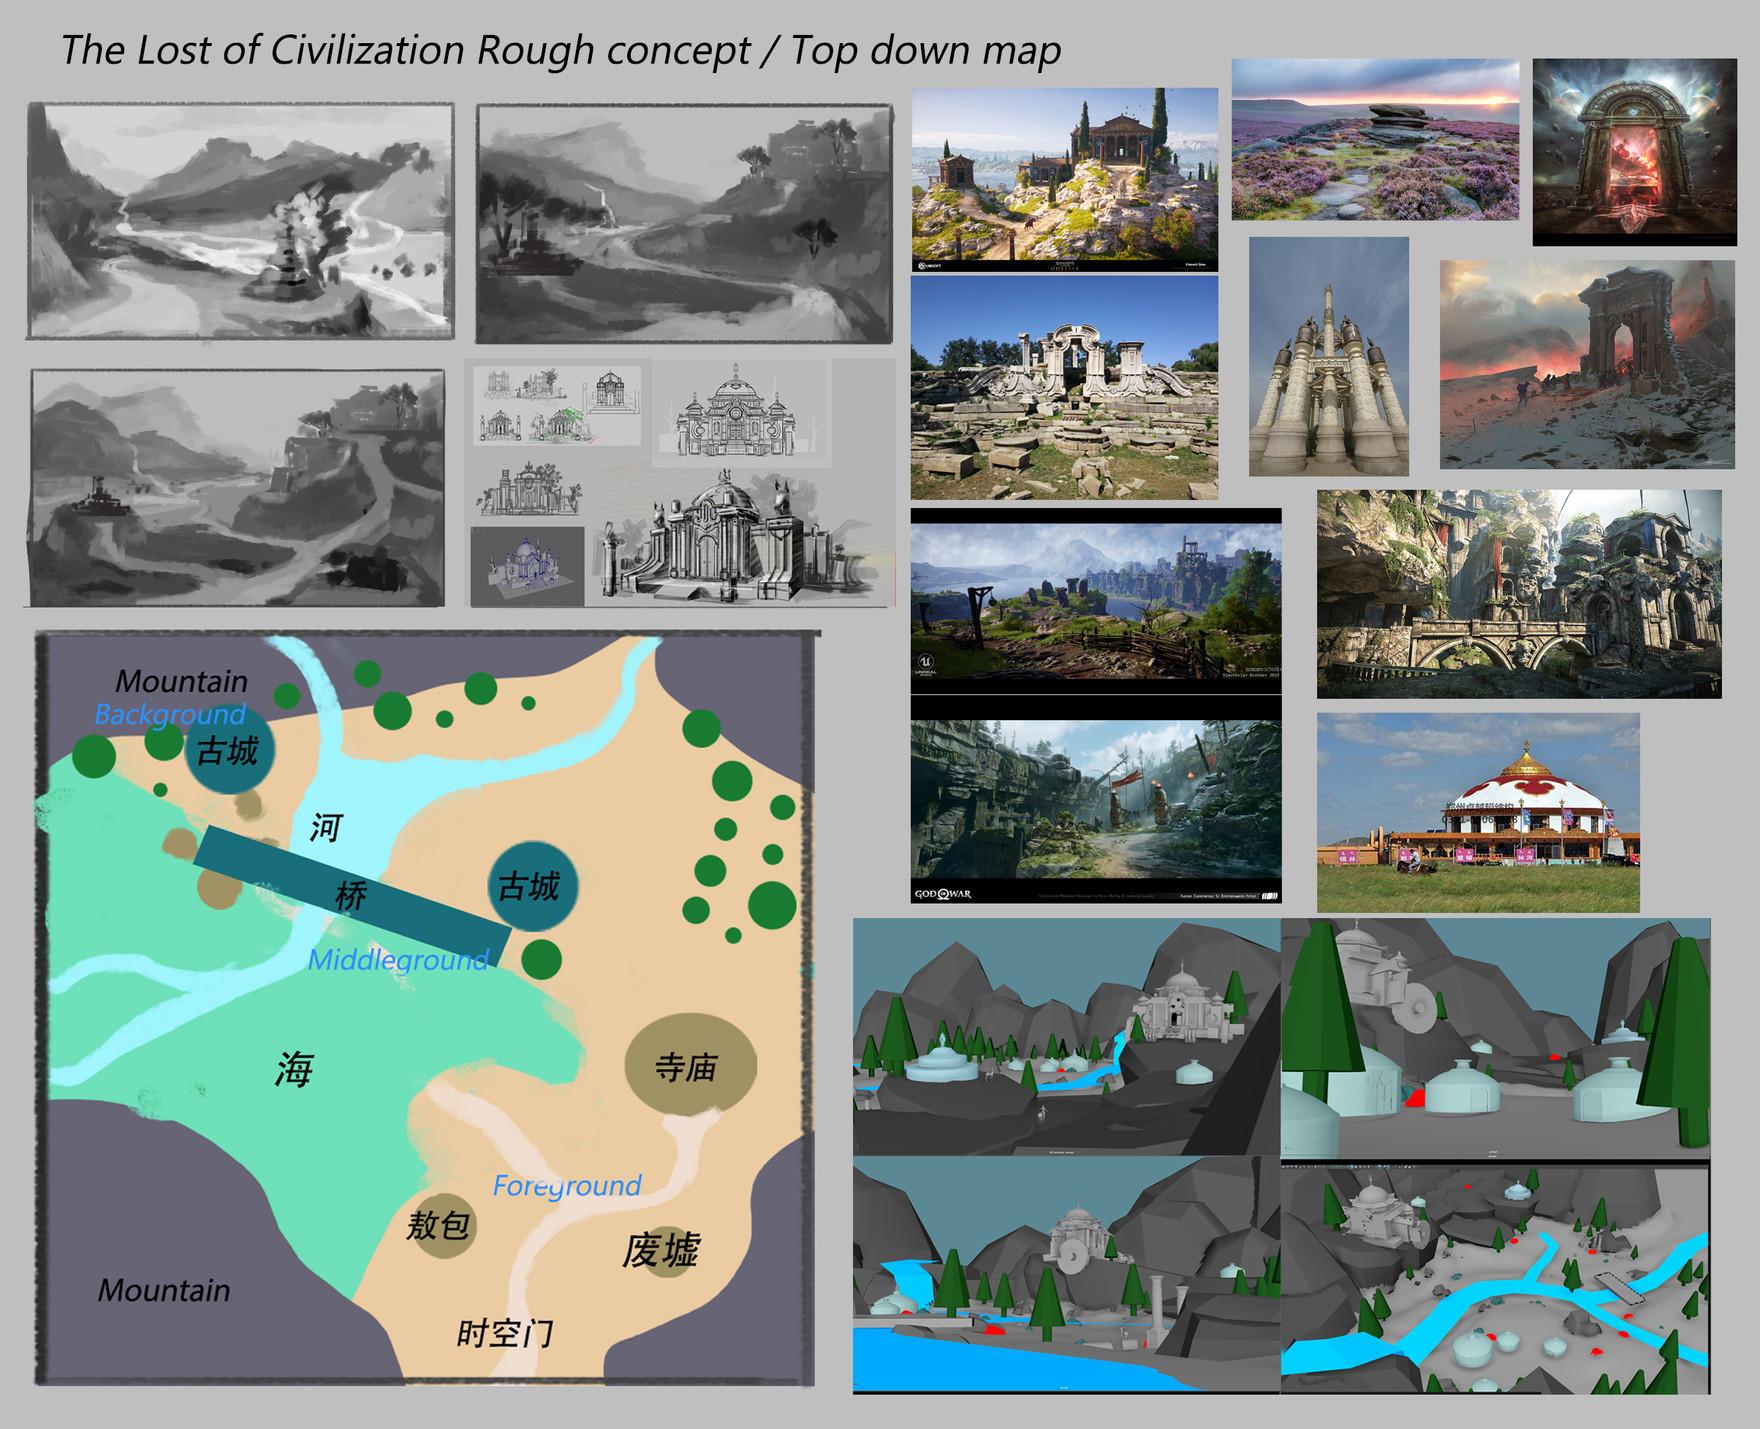 The Lost of Civilization Rough Concept a